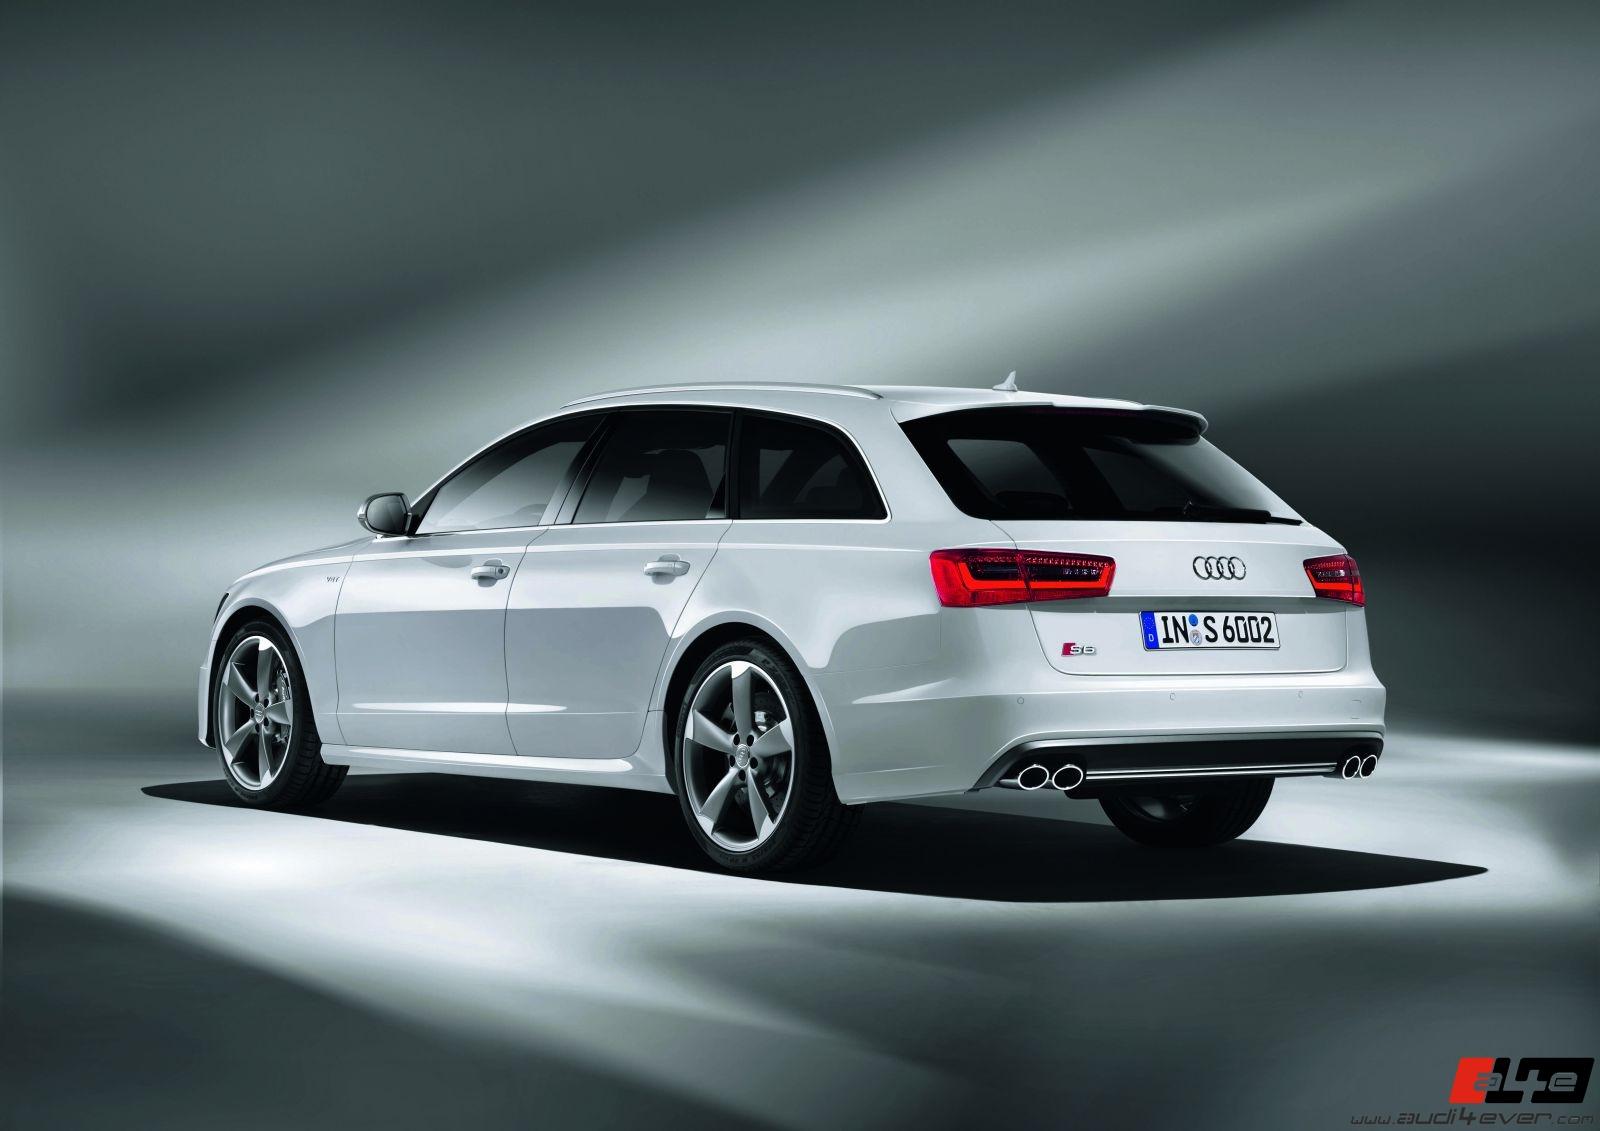 a4e - Gallery Audi A6 [C7] - Audi S6 [C7] Avant